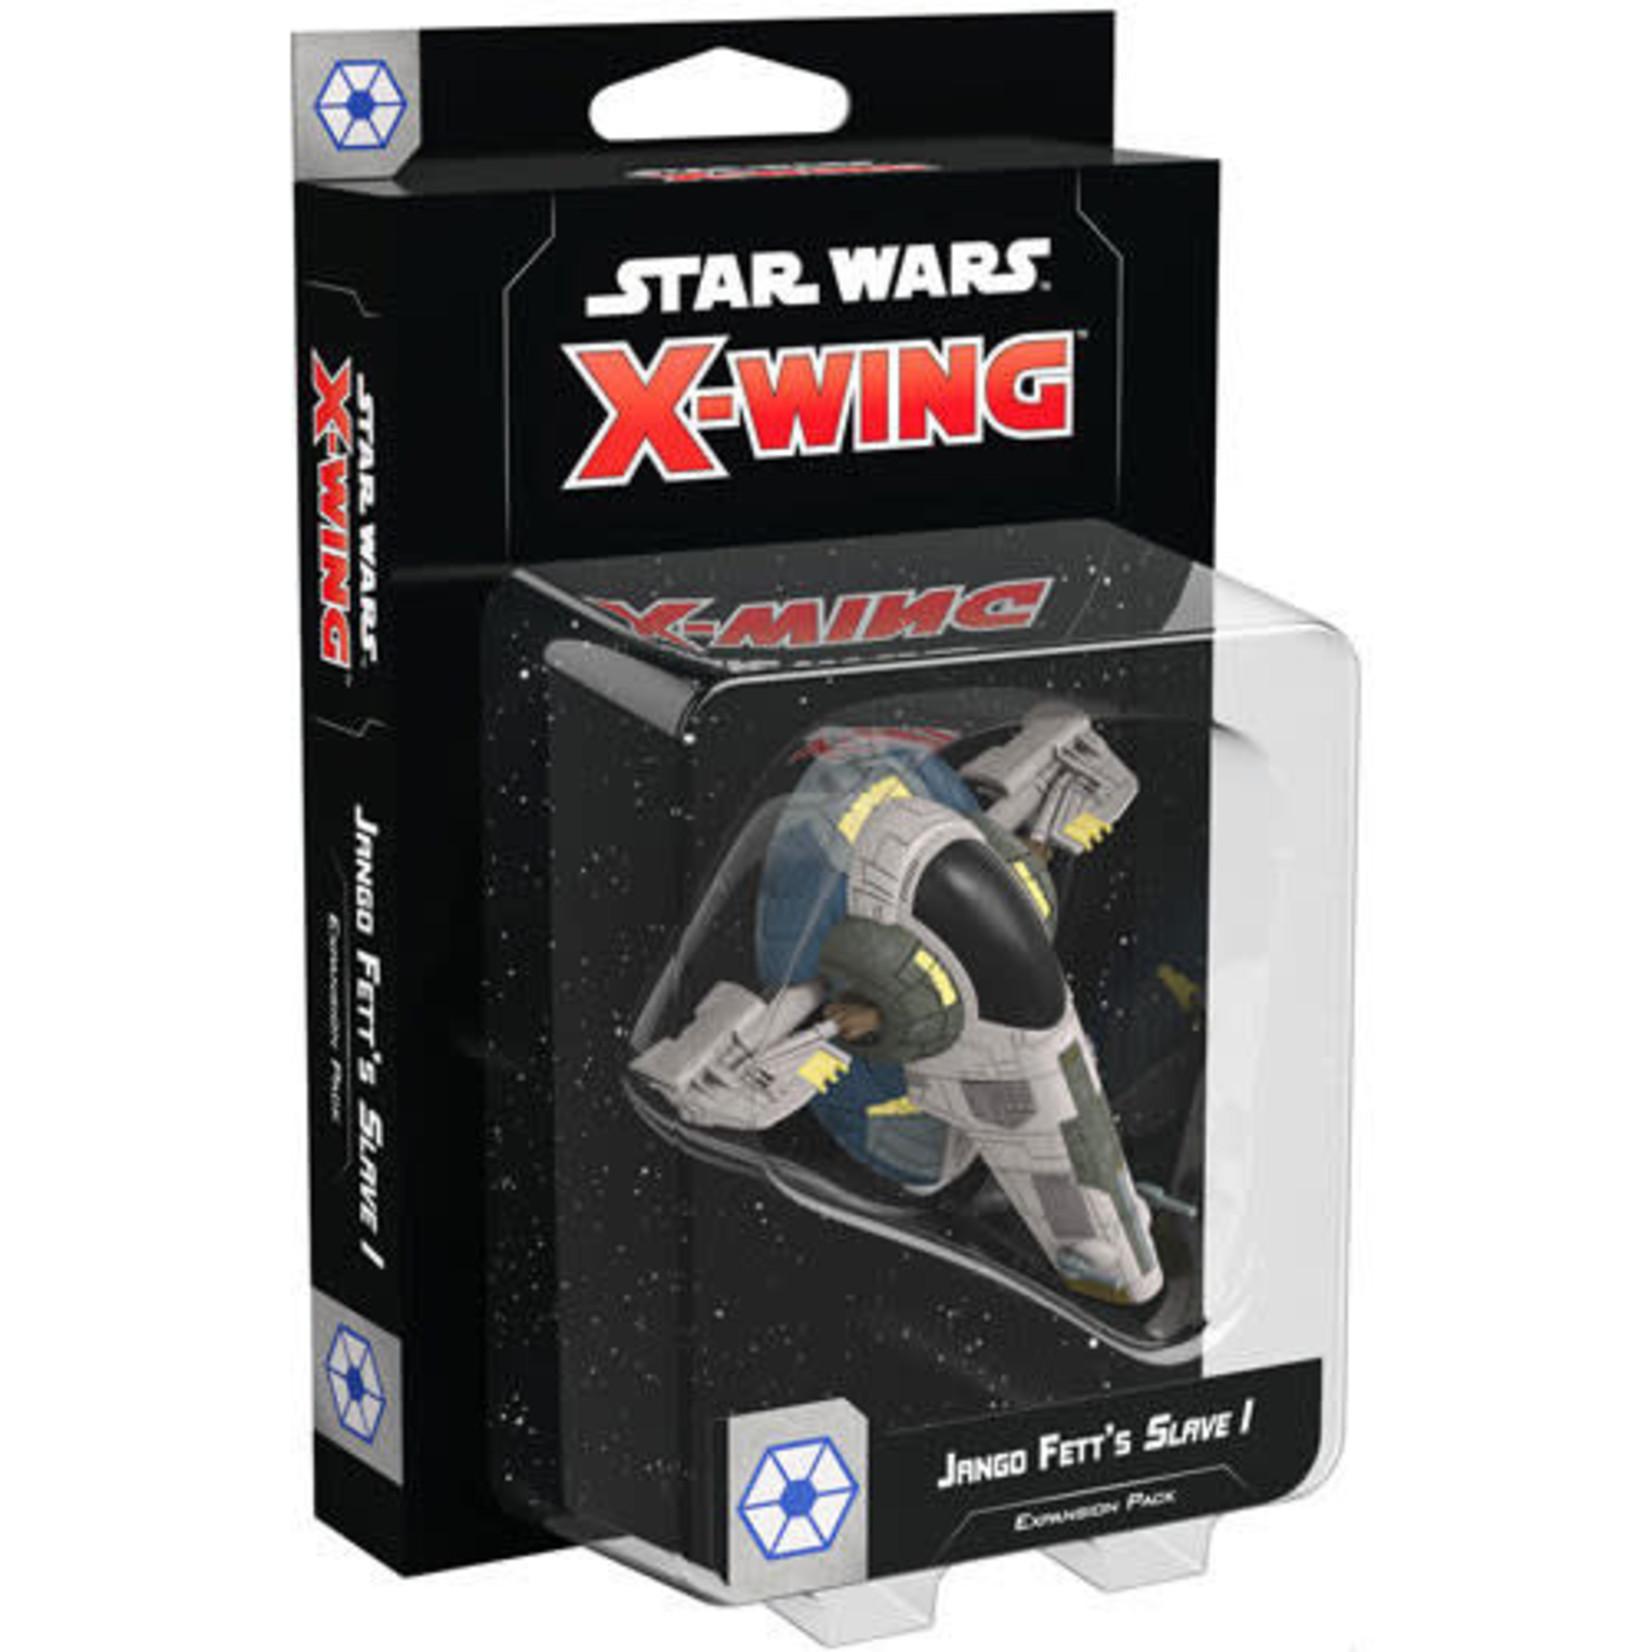 Star Wars X-Wing 2e: Jango Fett's Slave 1 Expansion